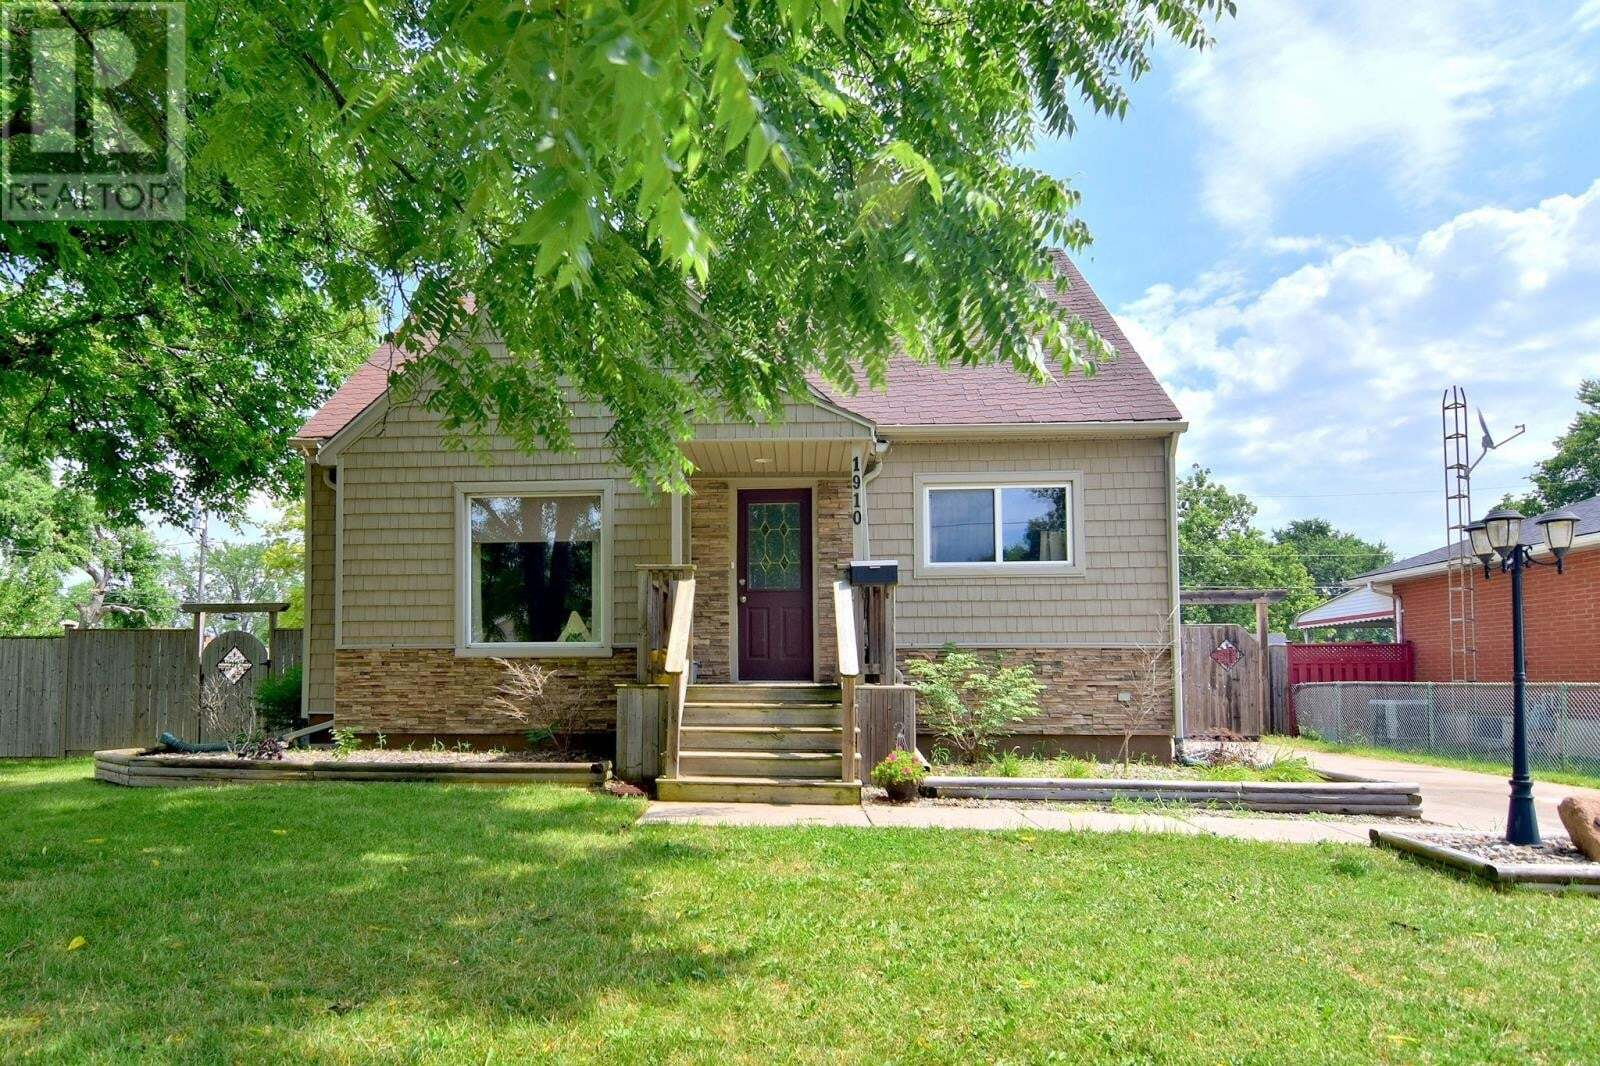 House for sale at 1910 Buckingham Dr Windsor Ontario - MLS: 20009490